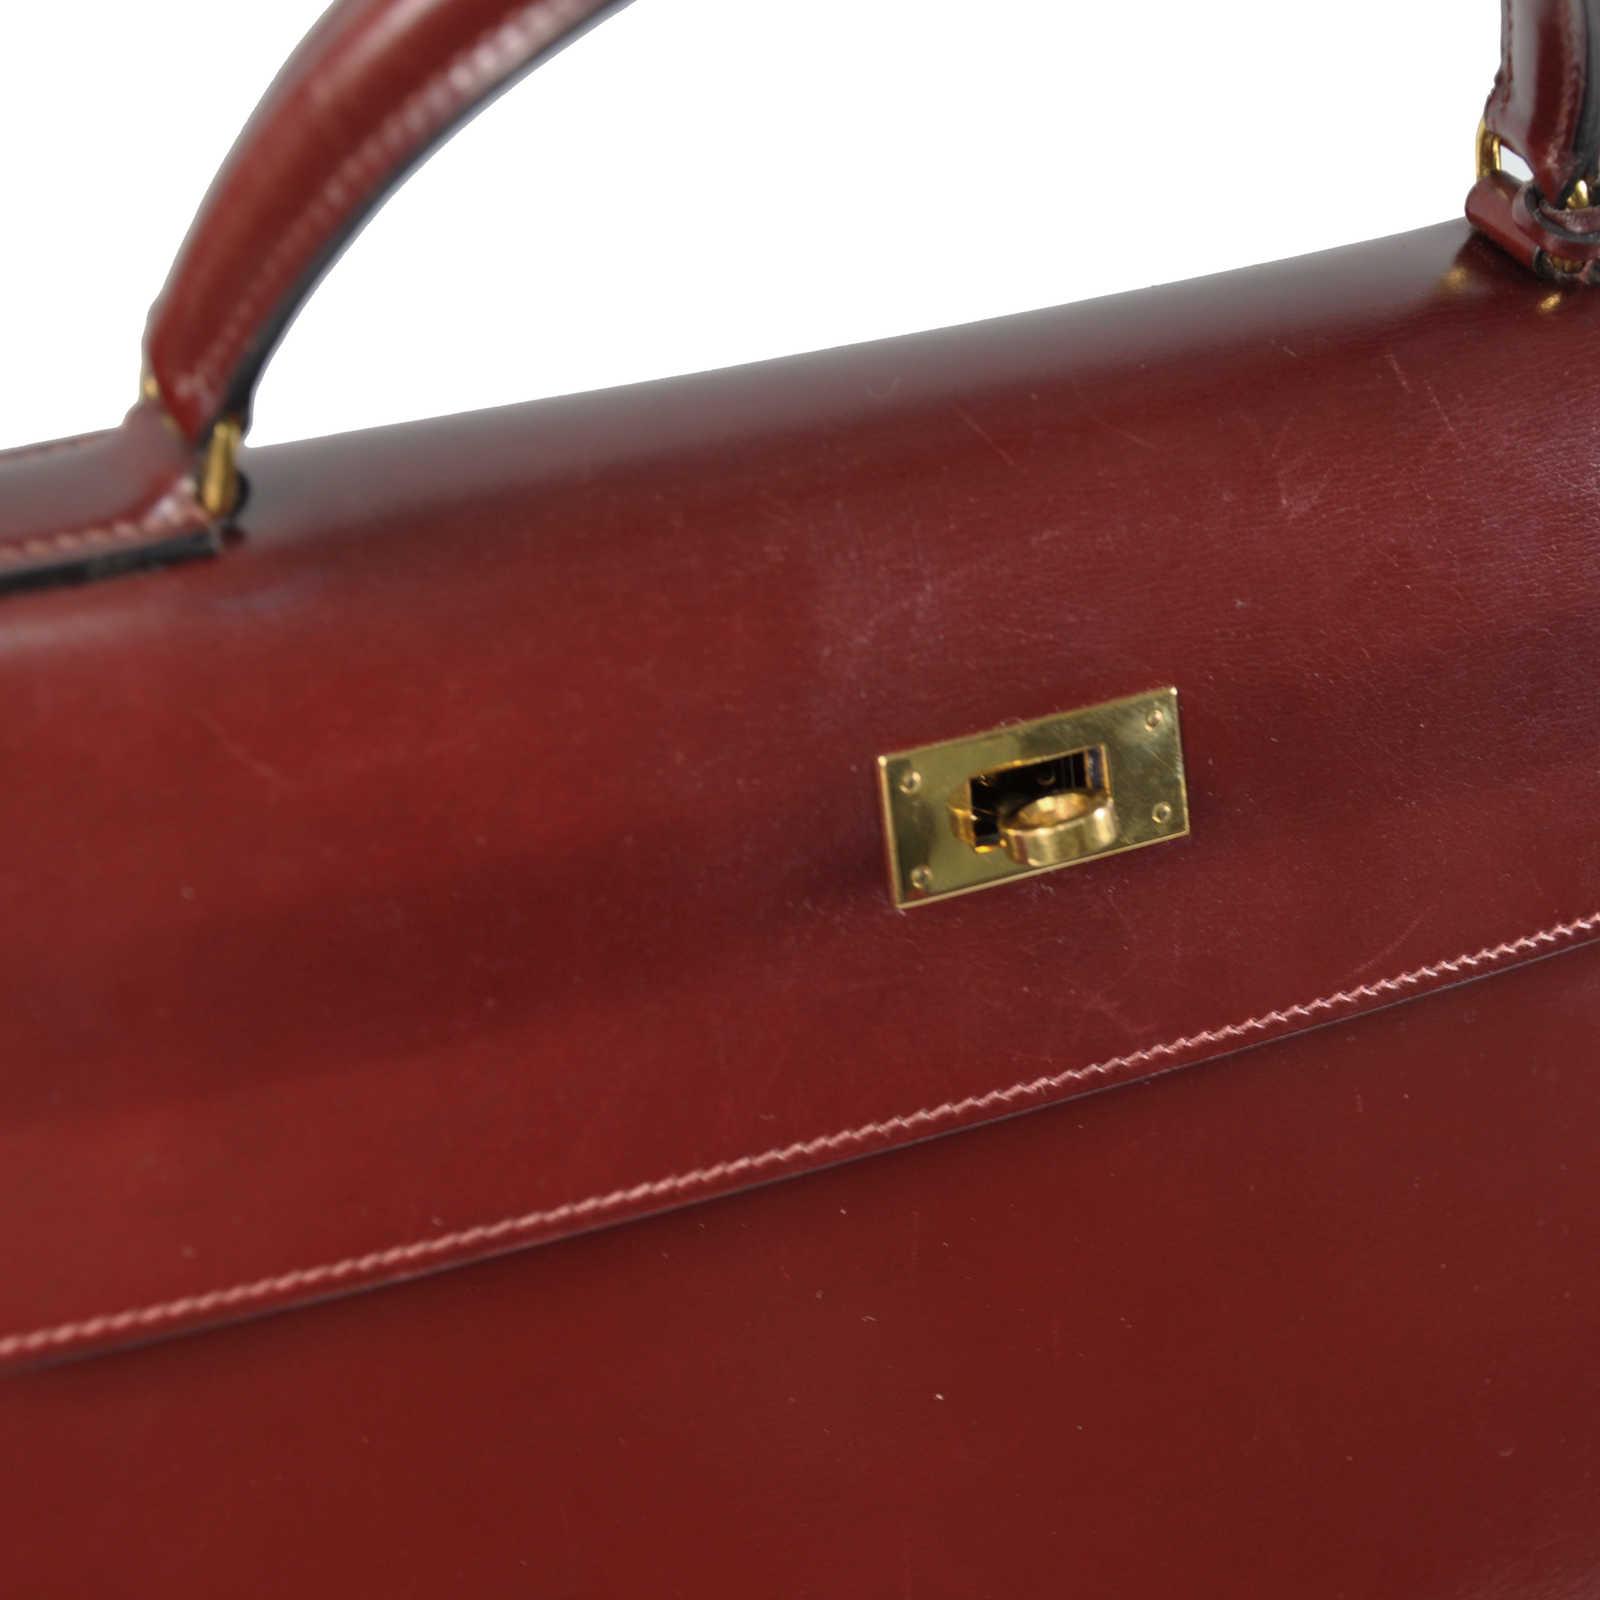 fcff187e2372 ... Authentic Vintage Hermès Burgundy Box Kelly 32 (TFC-107-00036) -  Thumbnail ...